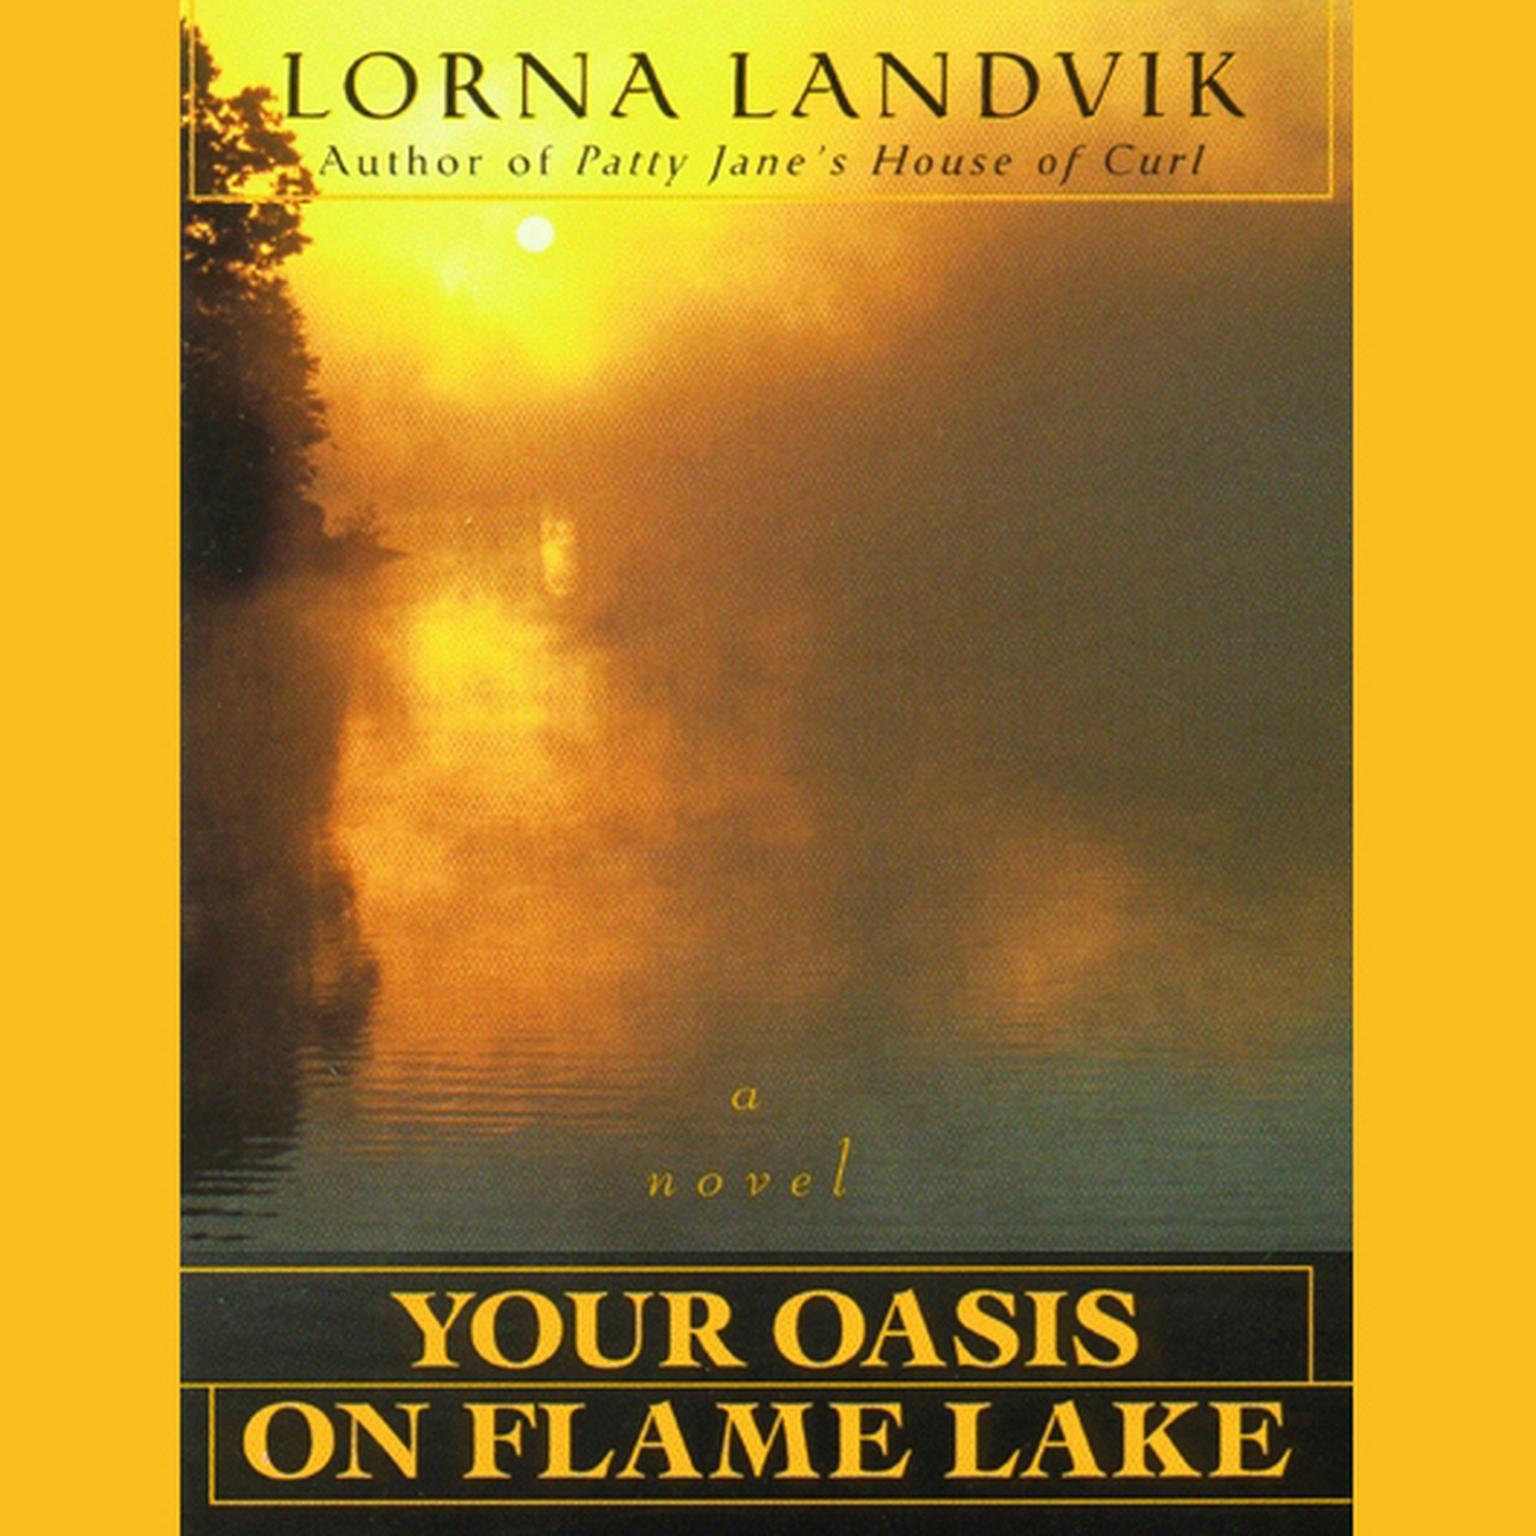 Printable Your Oasis on Flame Lake Audiobook Cover Art